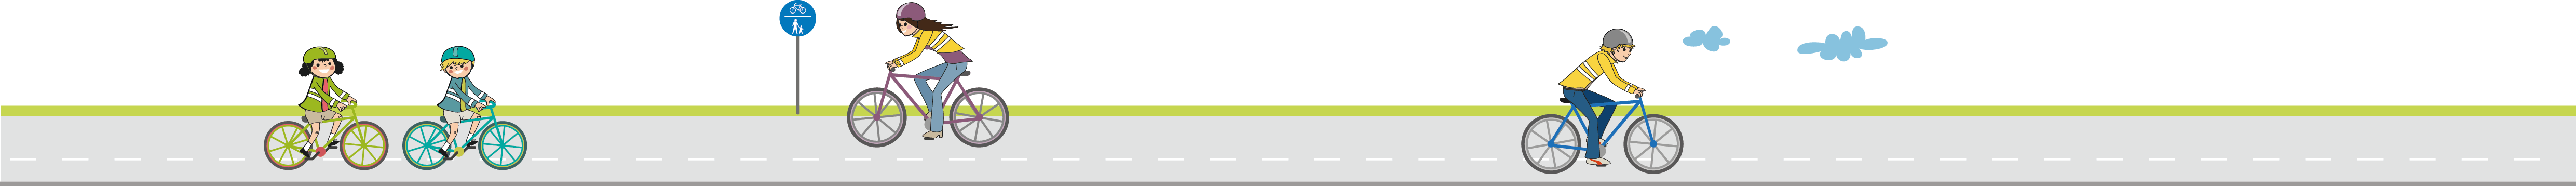 Illu-Radfahrende-Folder